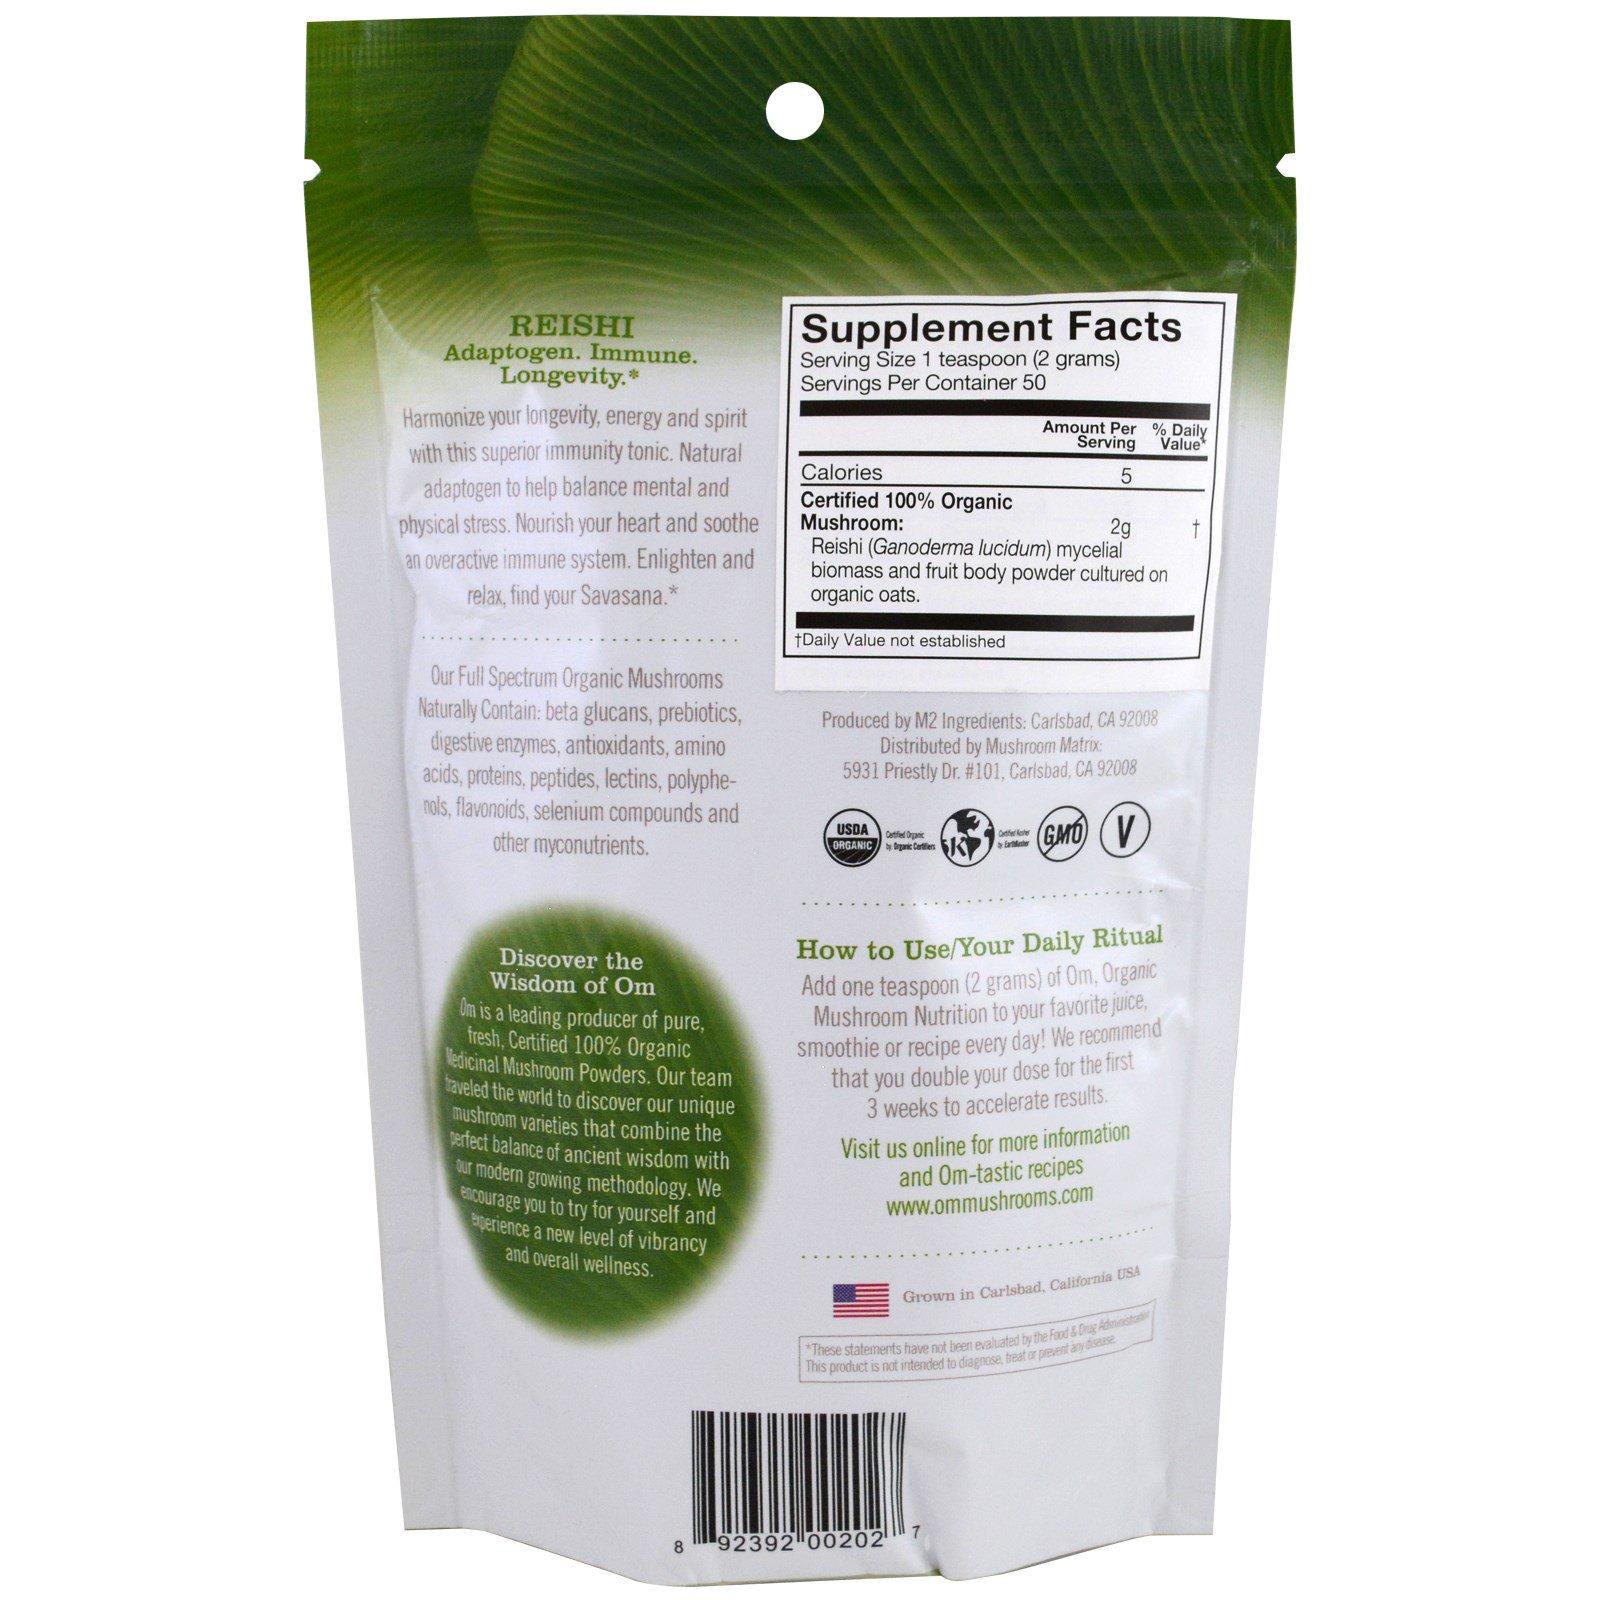 Organic Mushroom Nutrition, Reishi, Mushroom Powder, 3 57 oz